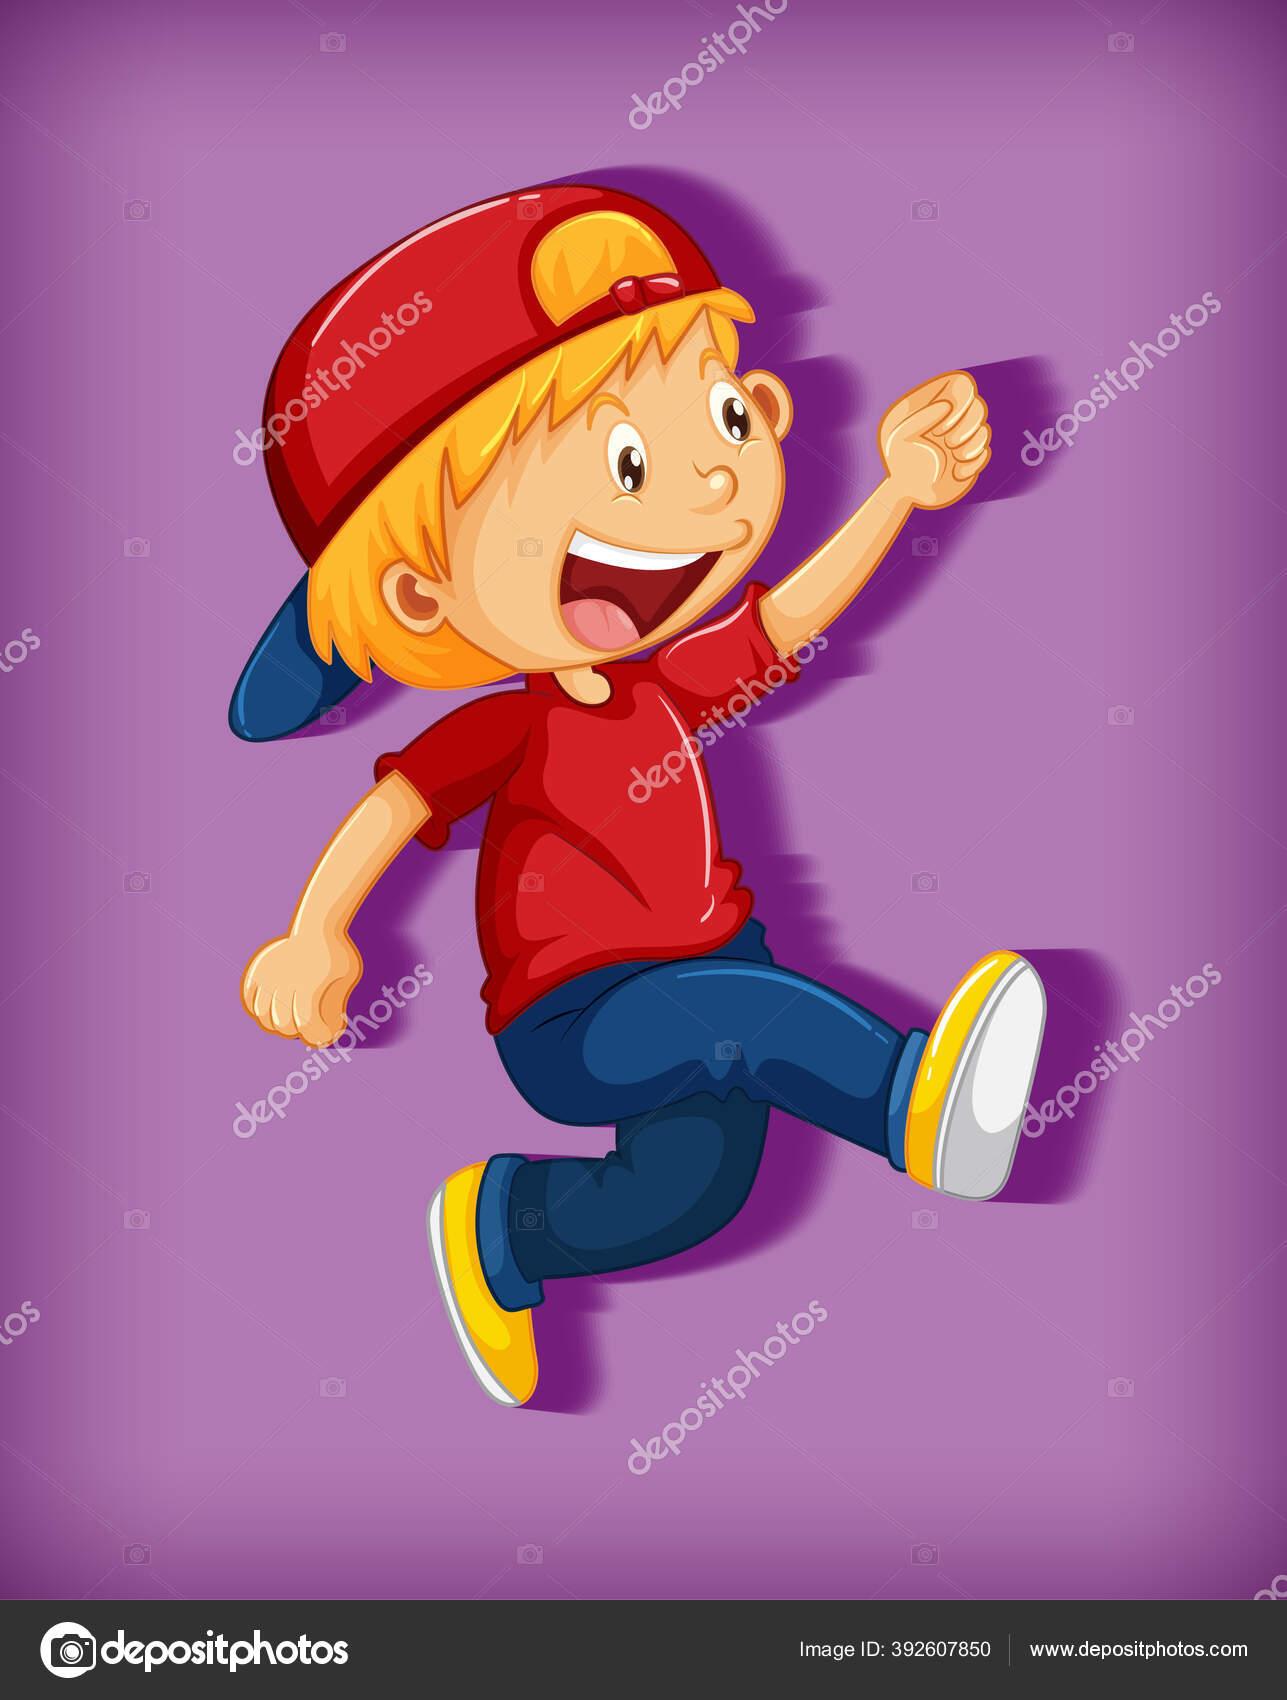 Anak Laki Laki Lucu Mengenakan Topi Merah Dengan Cengkeraman Posisi Stok Vektor C Interactimages 392607850